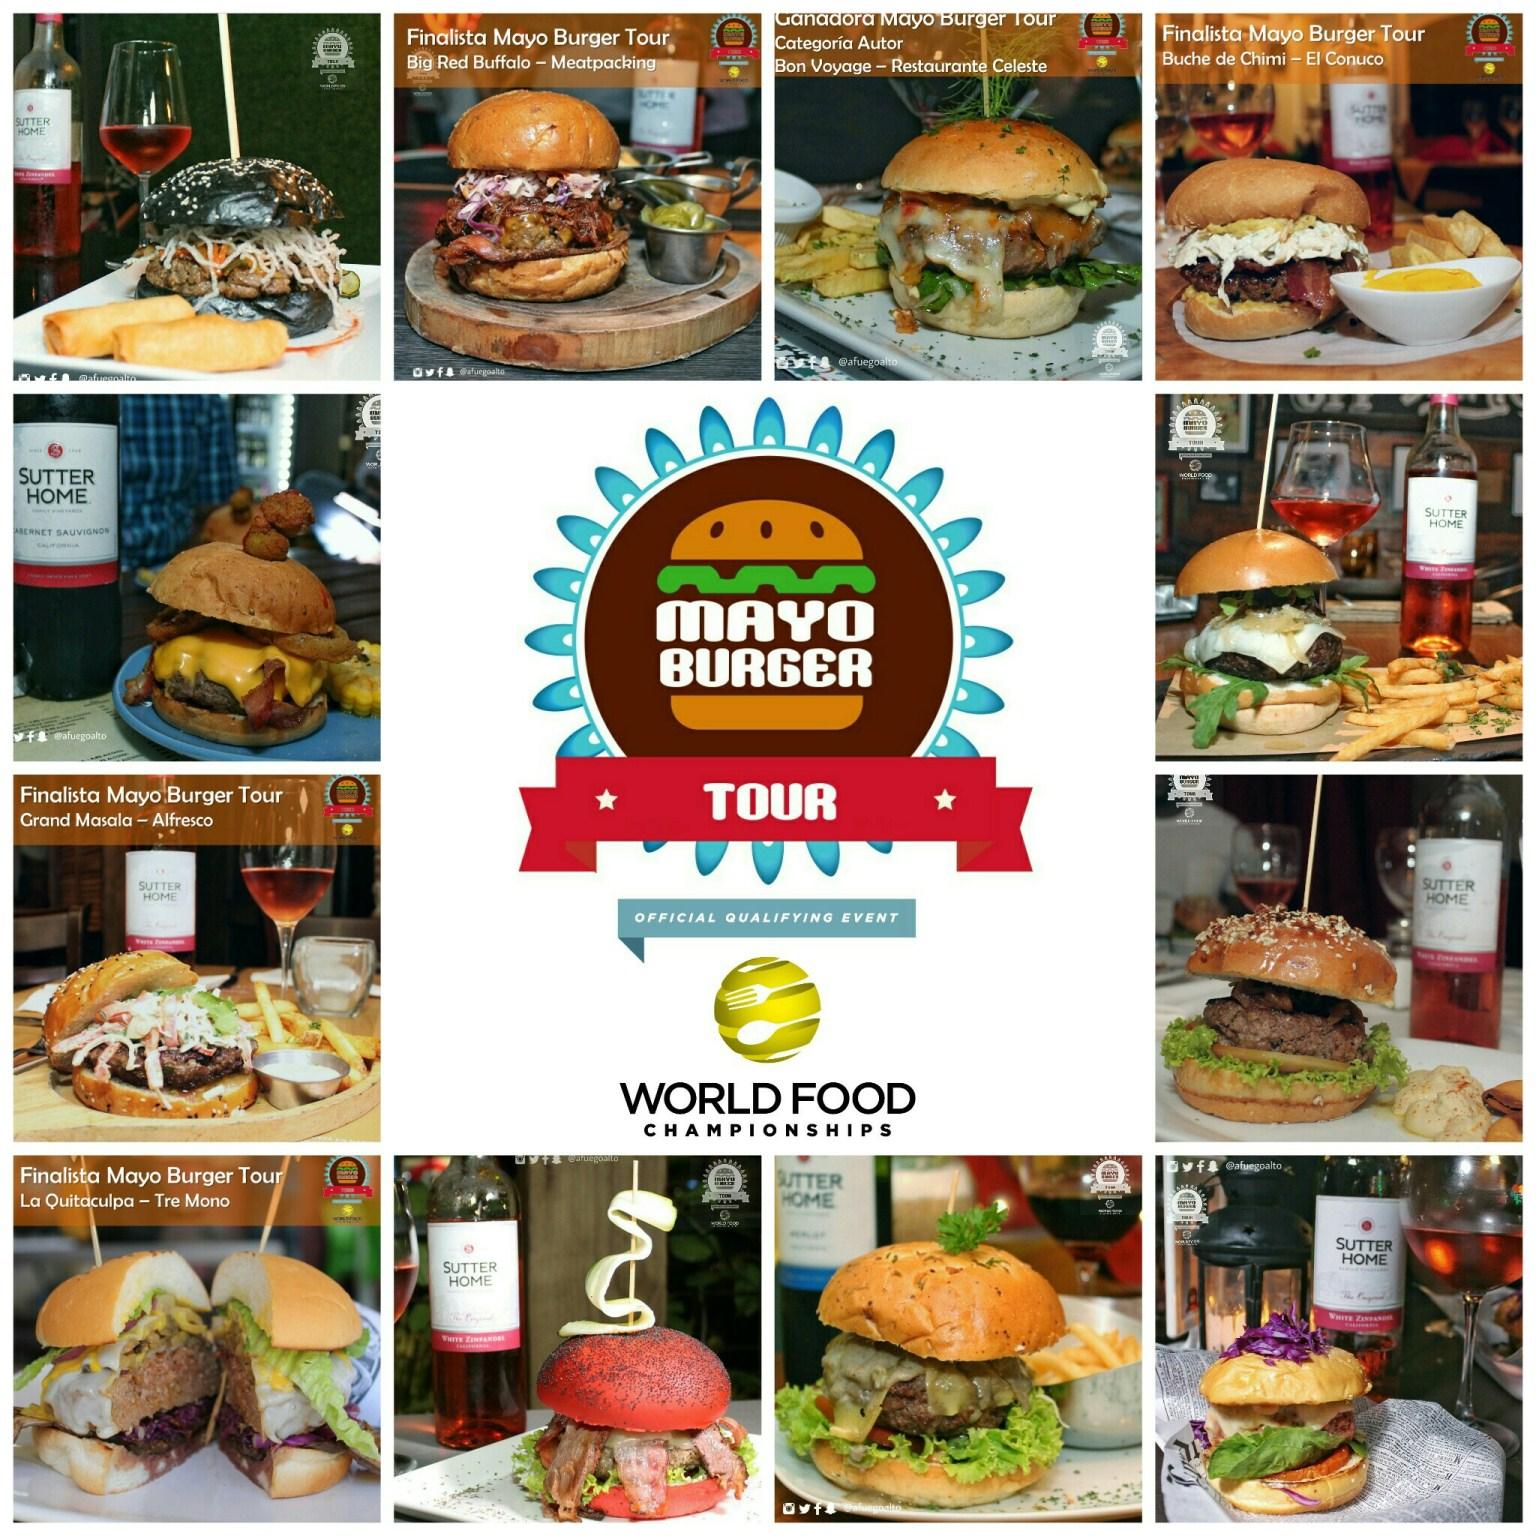 Las 12 mejores hamburguesas del Mayo Burger Tour 2016